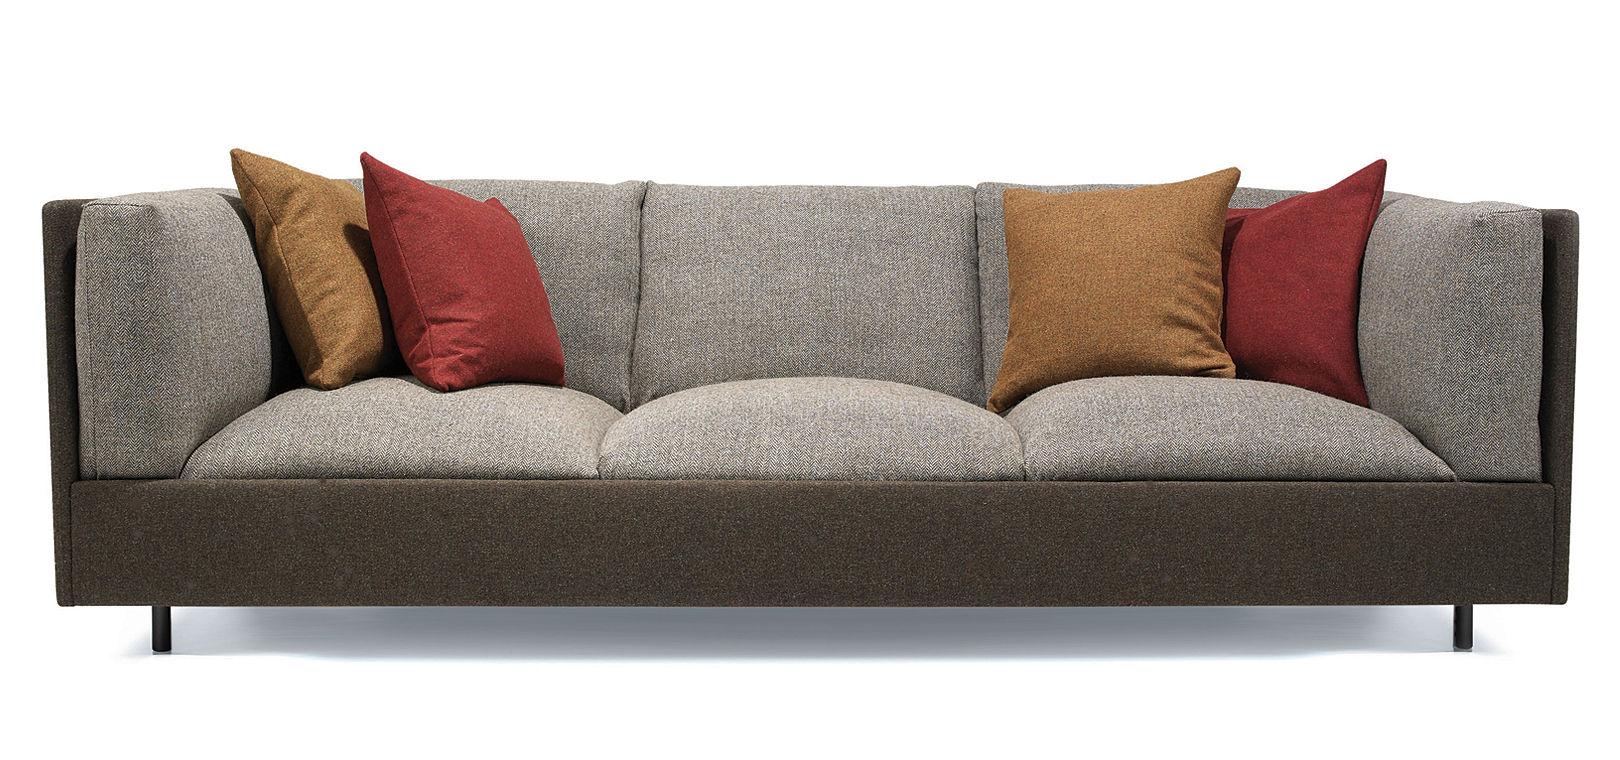 elegant contemporary sofa 68 for your modern sofa inspiration with contemporary BQZJFHU